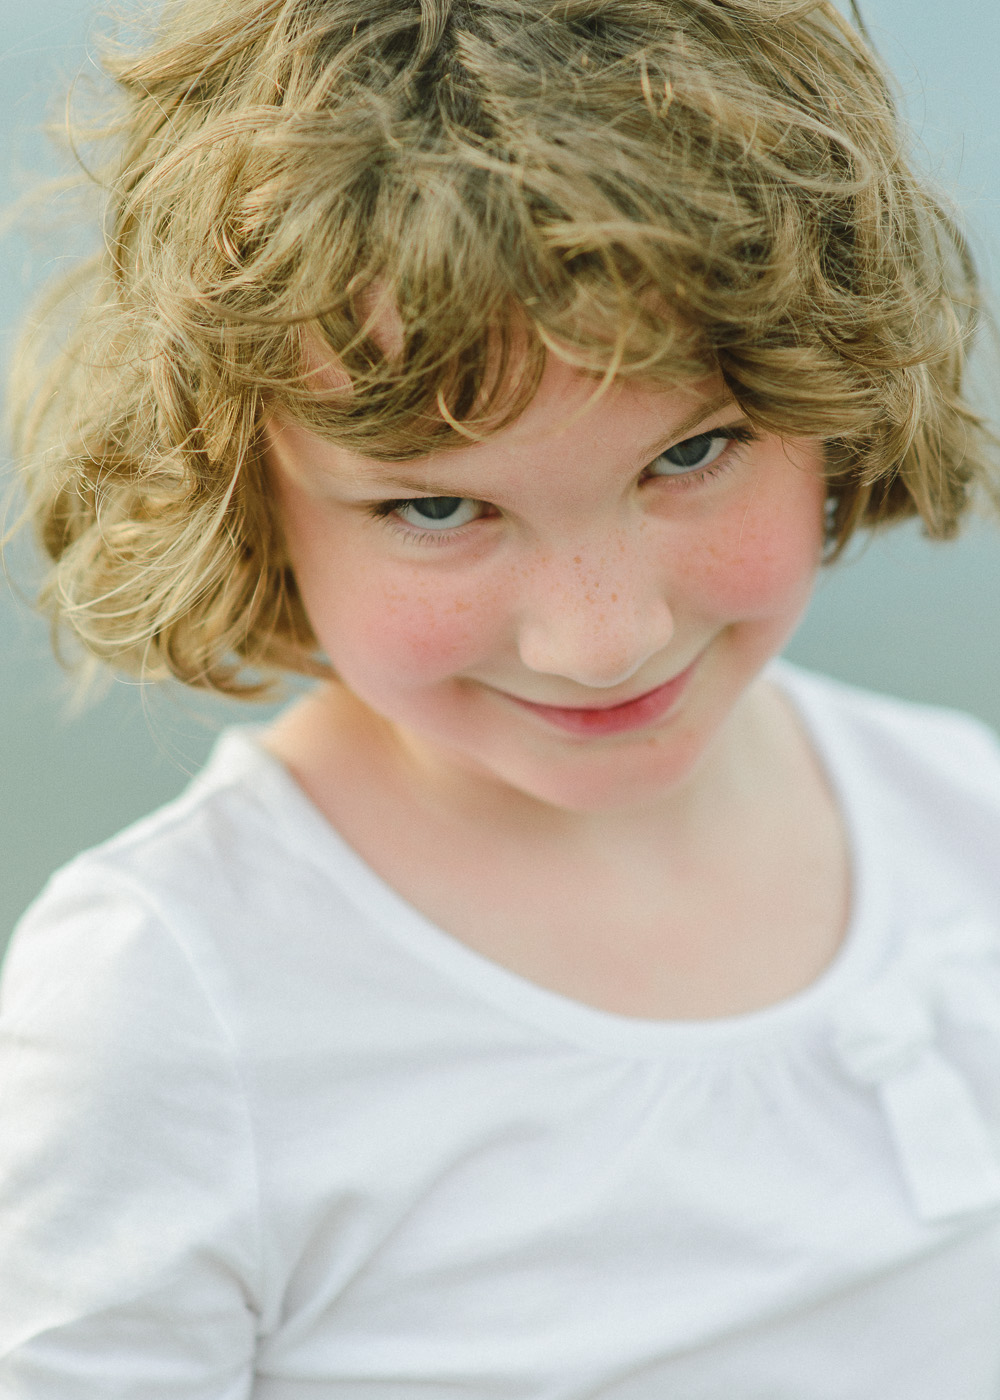 childfamilyportraitphotographerseattle.jpg